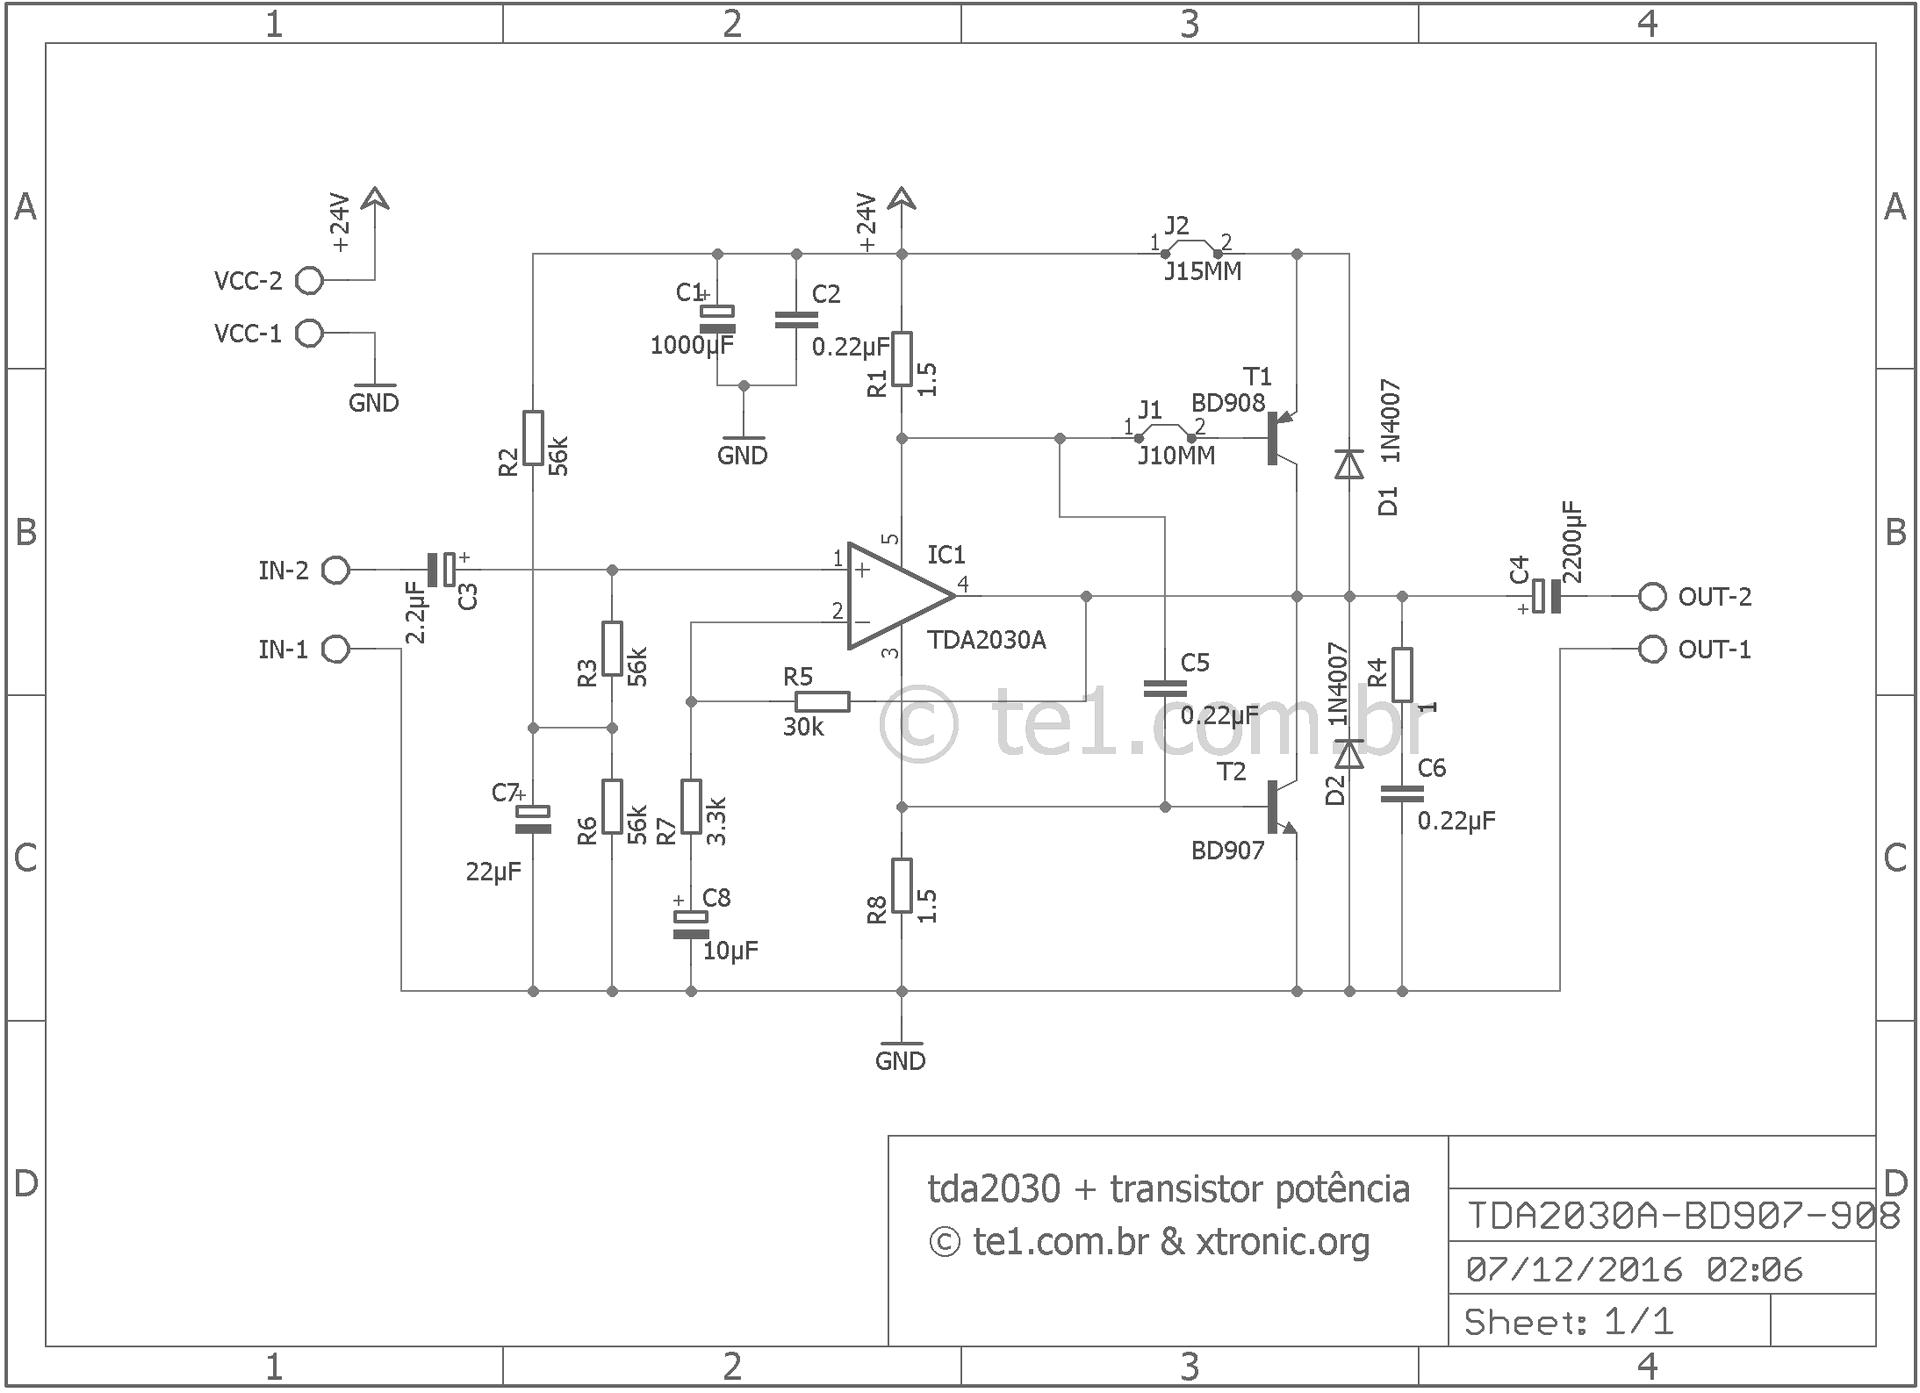 small resolution of tda2030 40 watt amplifier transistor power esquem 700x508 amplificador pot ncia tda2030 transistores tip41 e tip42